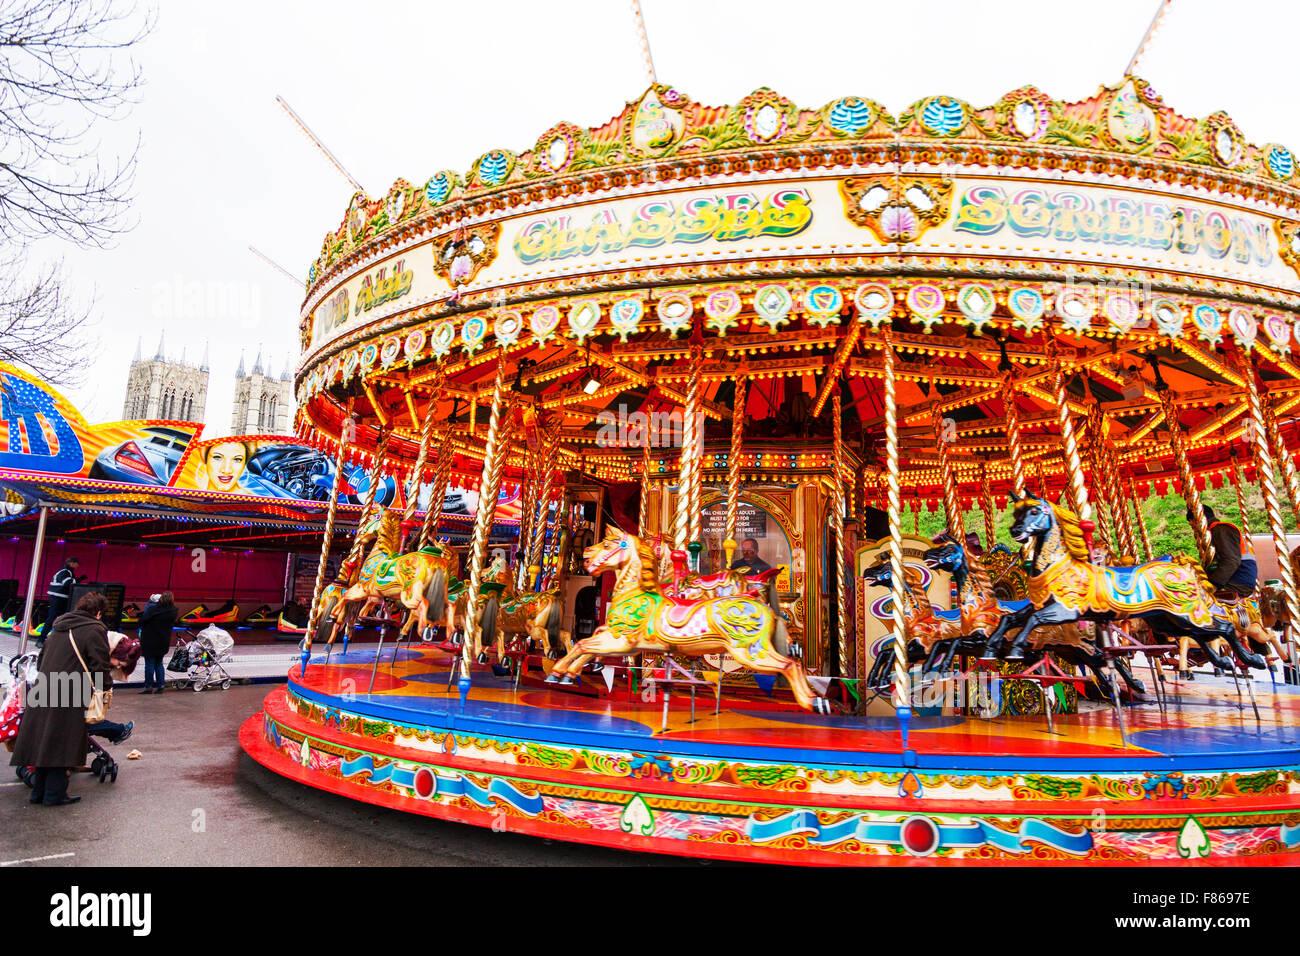 Merry go round fair ride merry-go-round funfair children's rides fun enjoyment Lincoln Christmas Market 06/12/2015 Stock Photo